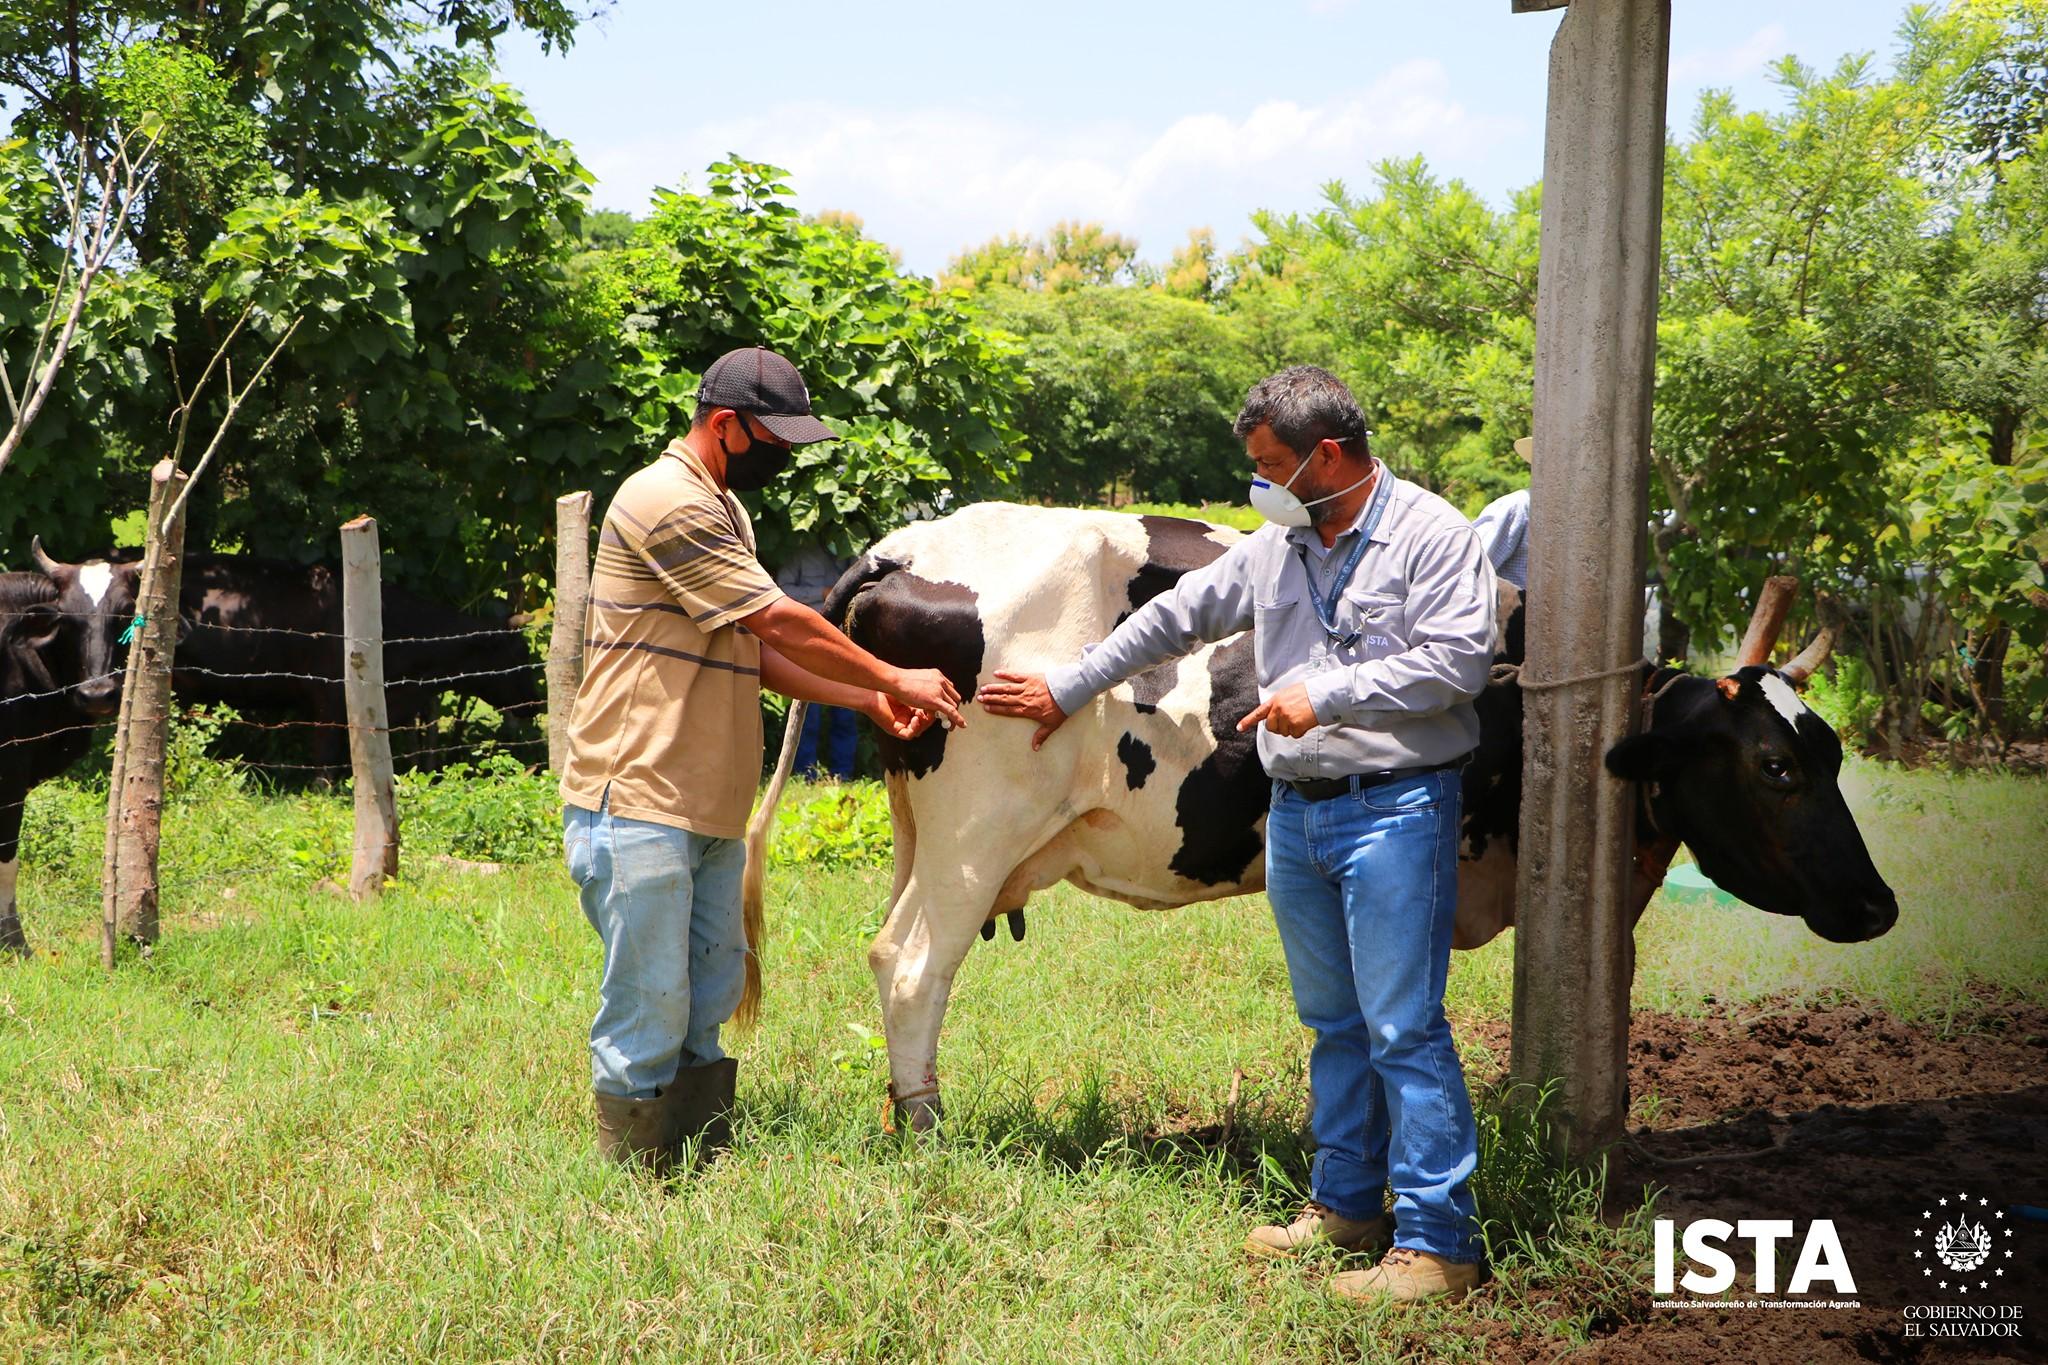 Desarrollamos jornadas de aplicación desparasitantes para ganado bovino